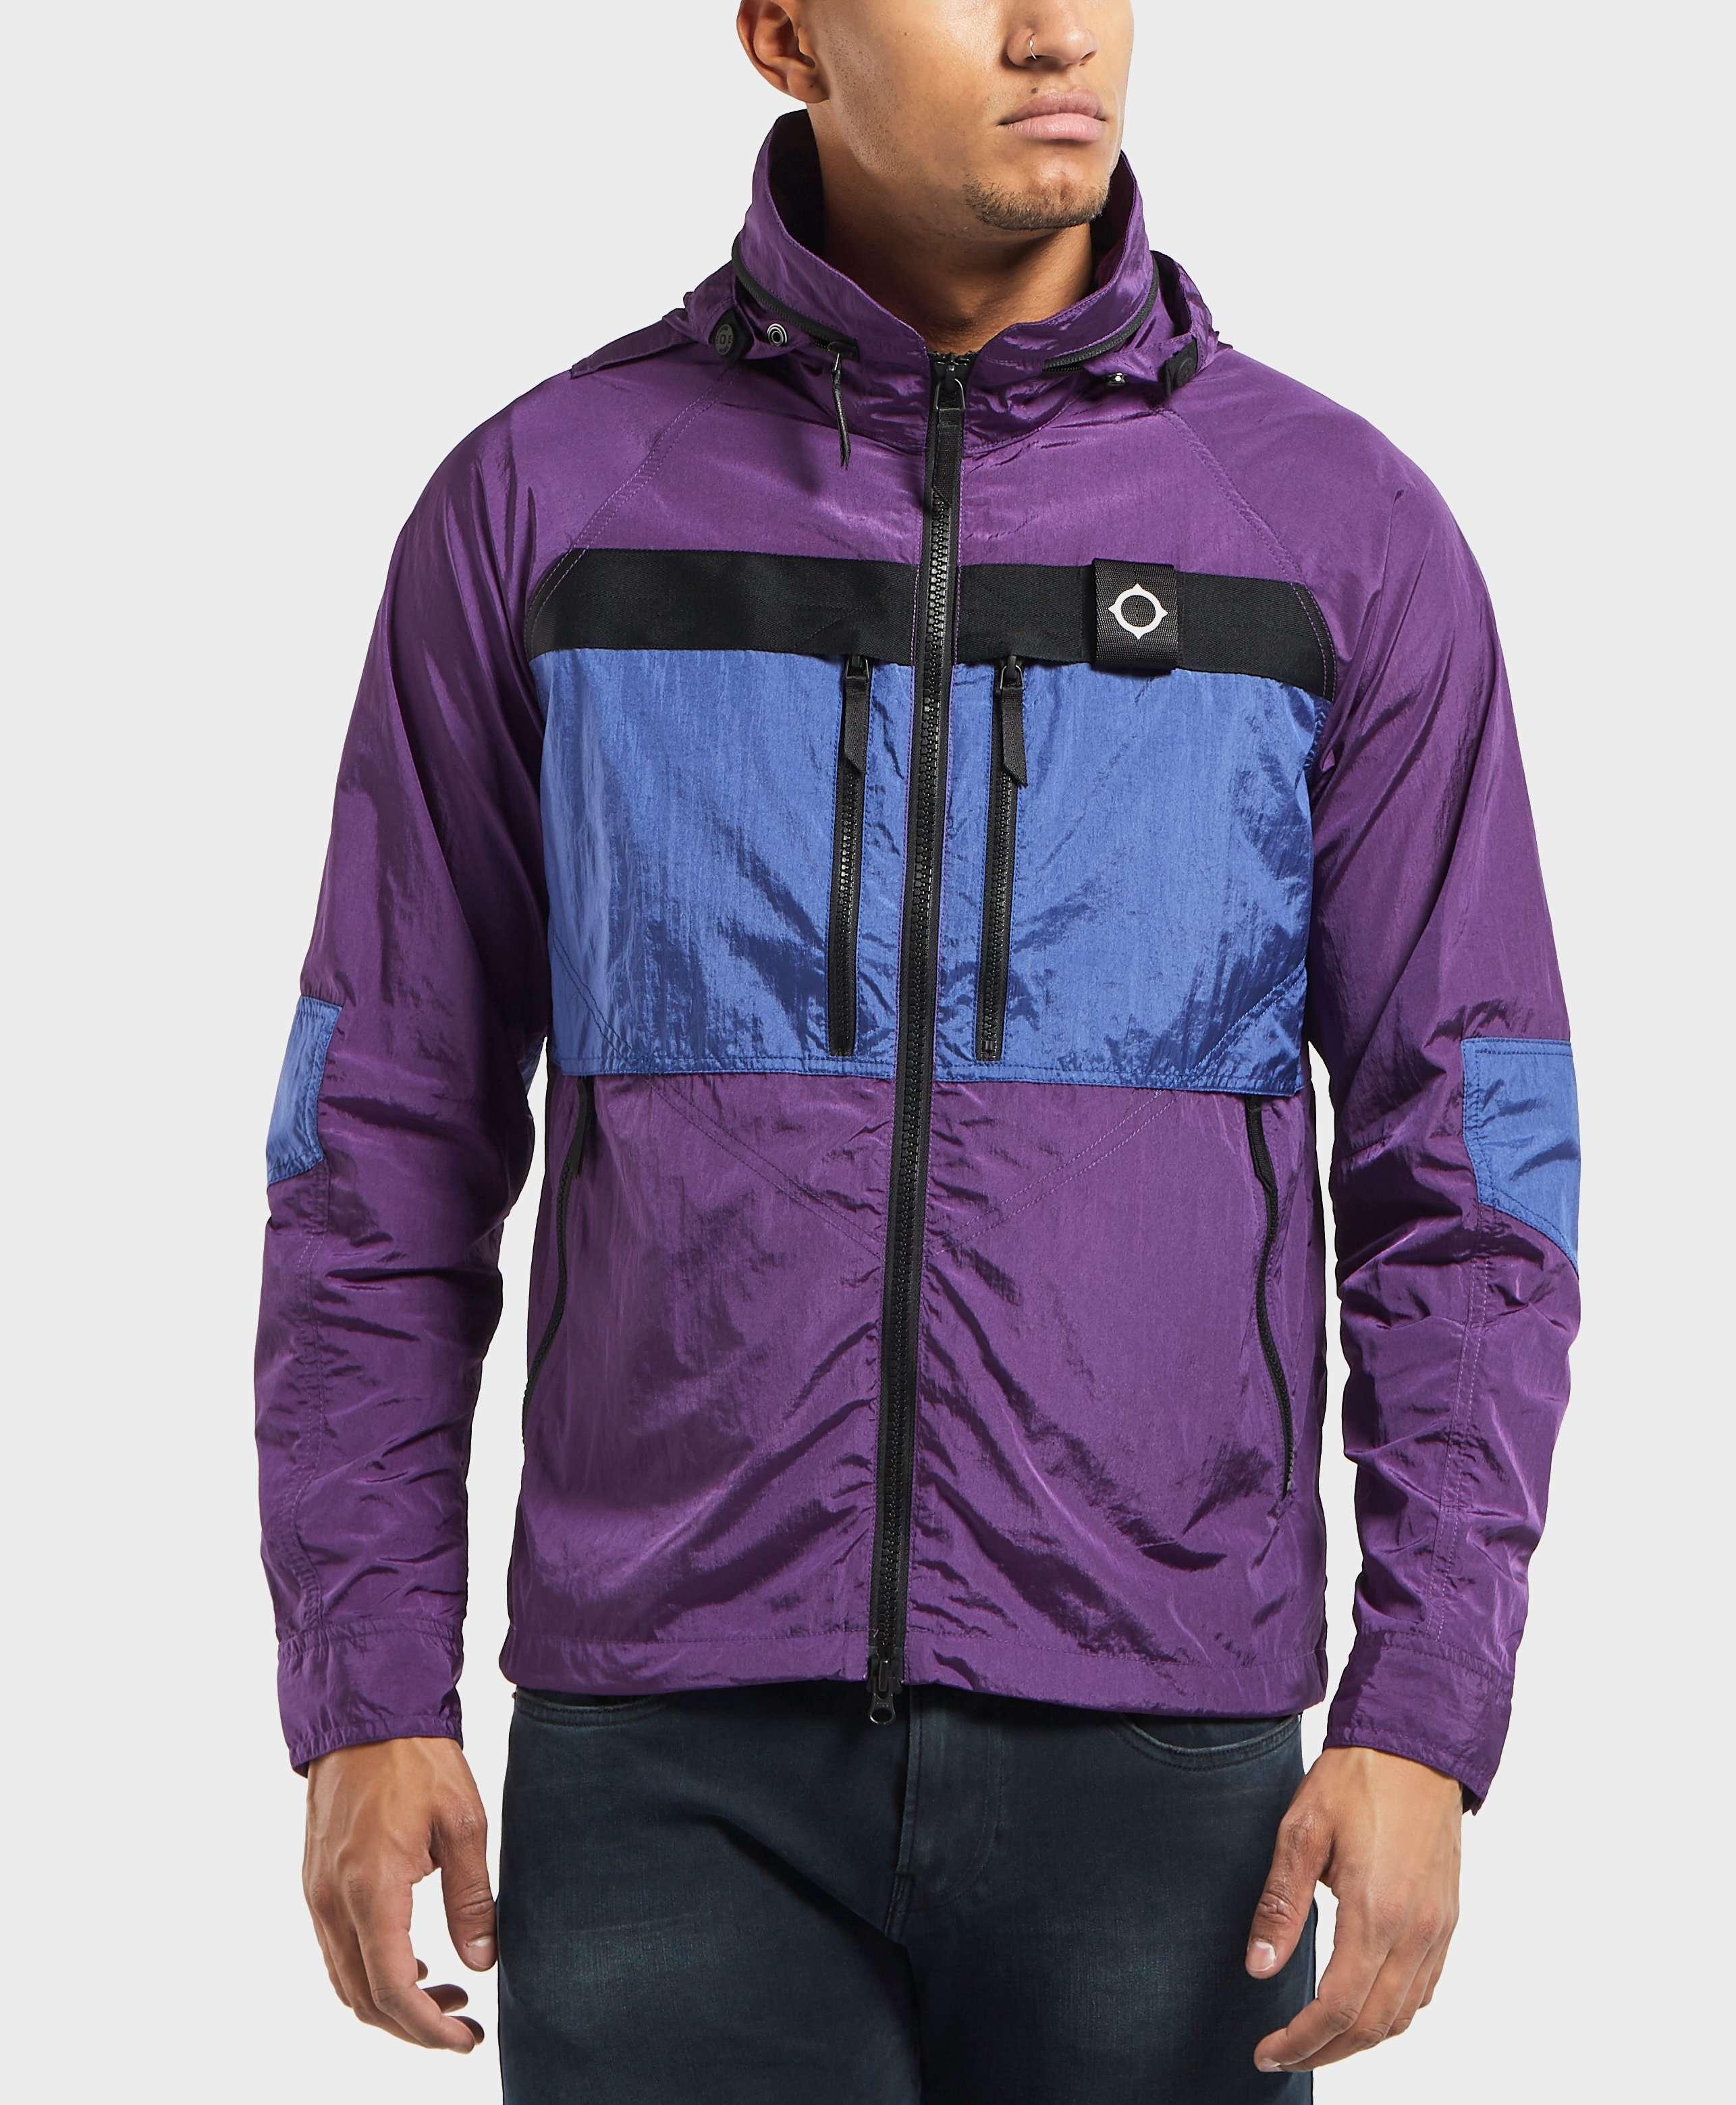 MA STRUM Corvus Nylon Jacket